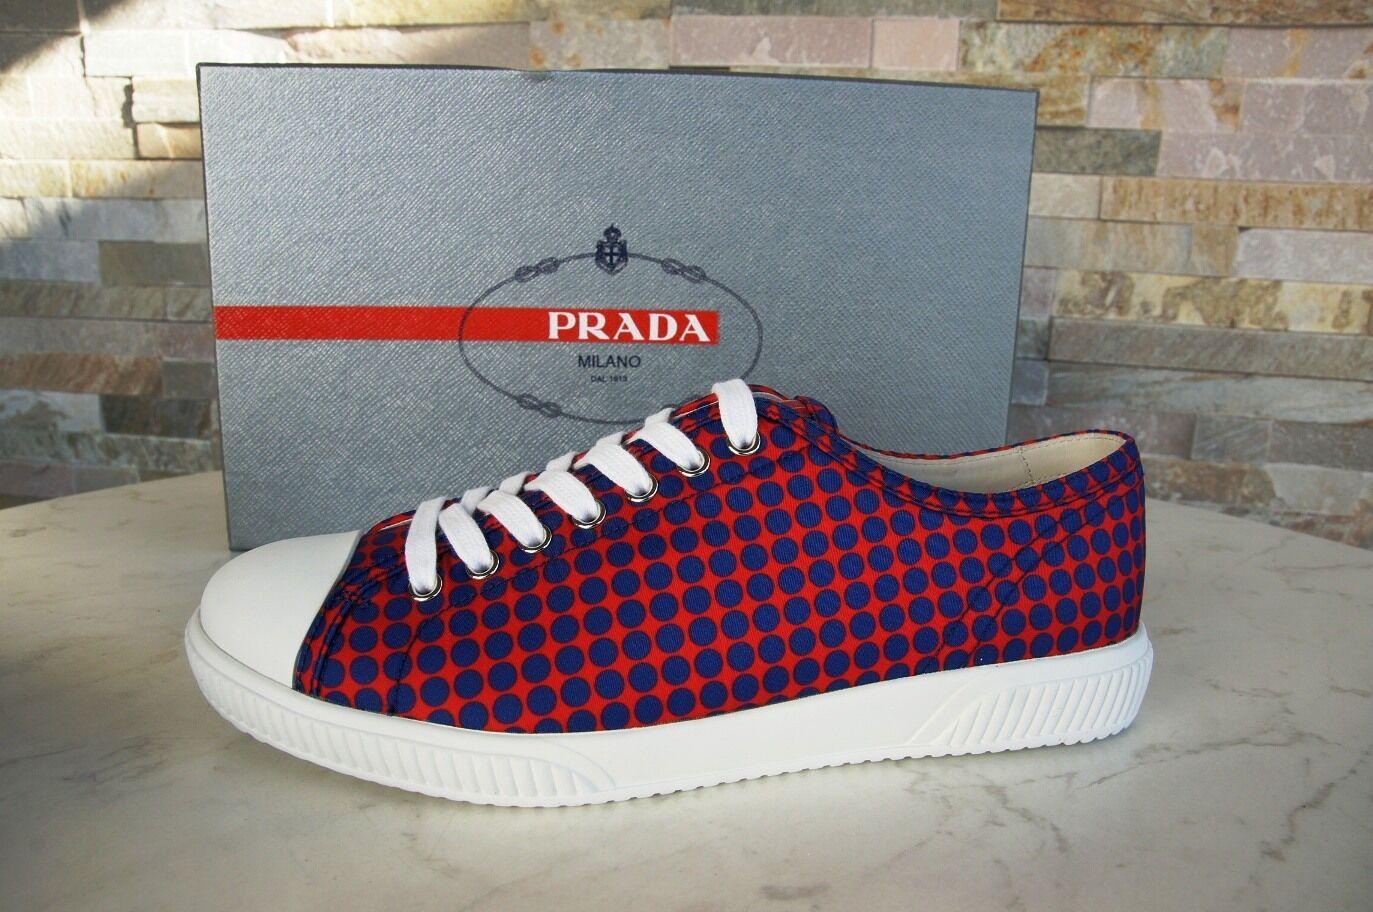 PRADA Gr 40  6 Herren mehrfarbig Sneakers Schuhe schuhe Punkte mehrfarbig Herren  NEU UVP 370 7cd0ac